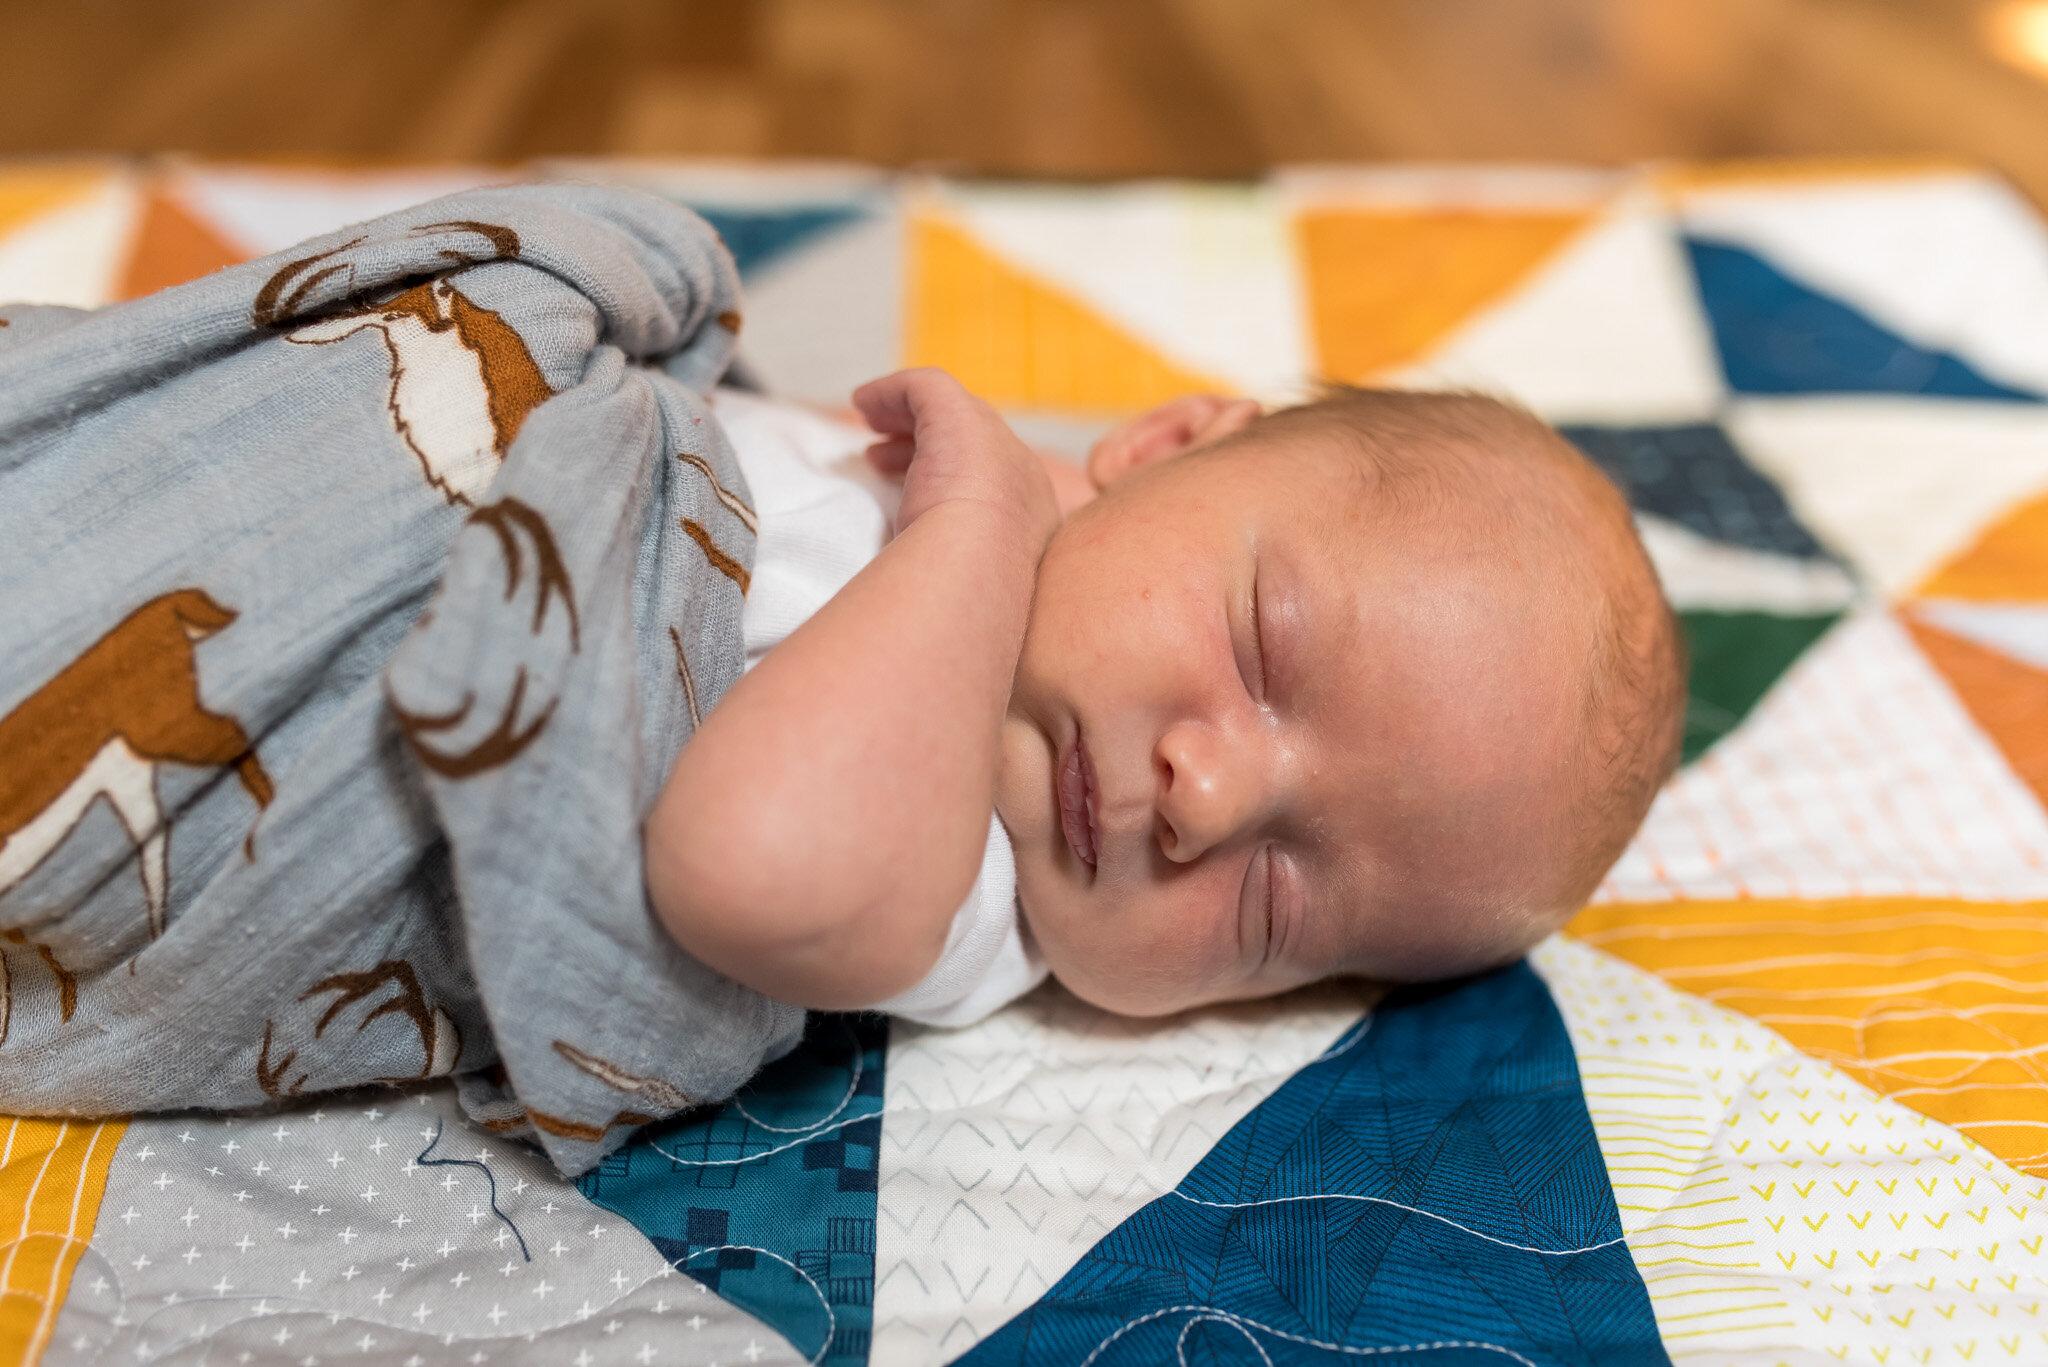 newborn-photography-decatur-georgia-tabitha-maegan-photography (7).jpg